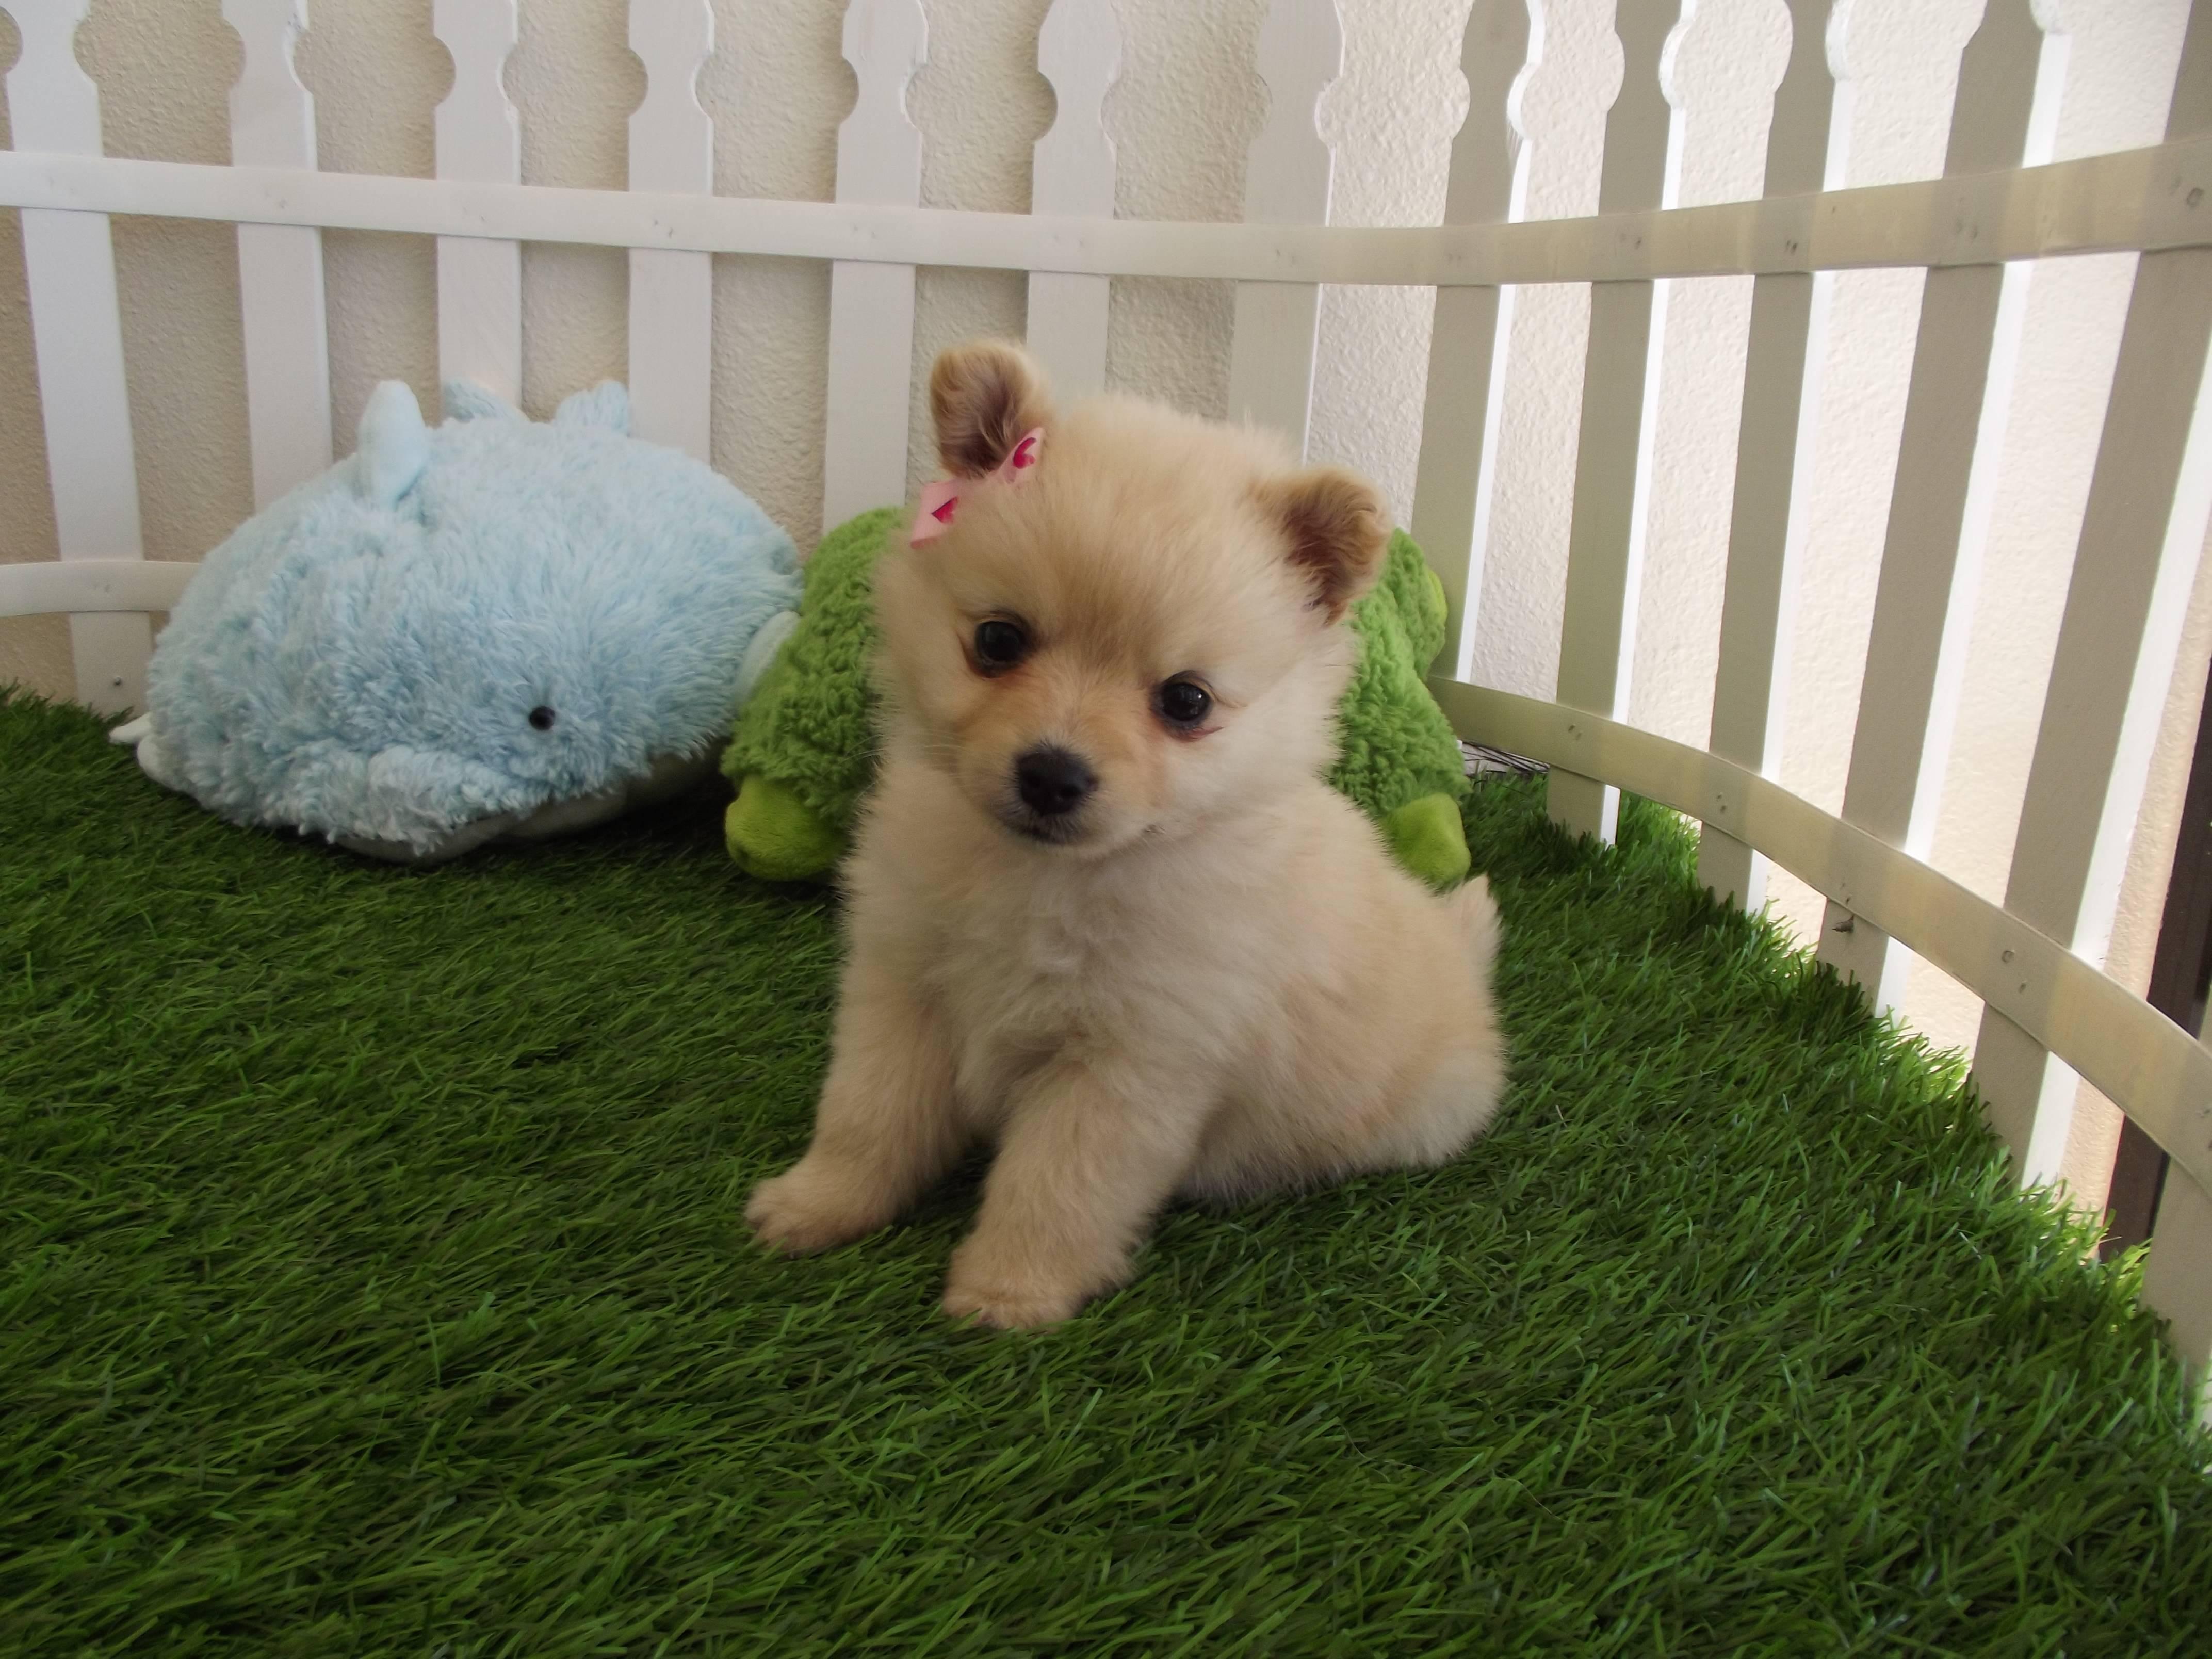 So cute puppies wallpaper 15897245 fanpop - Cute Puppy Wallpaper Cute Puppy Hd Wallpaper 3957 Ssofc